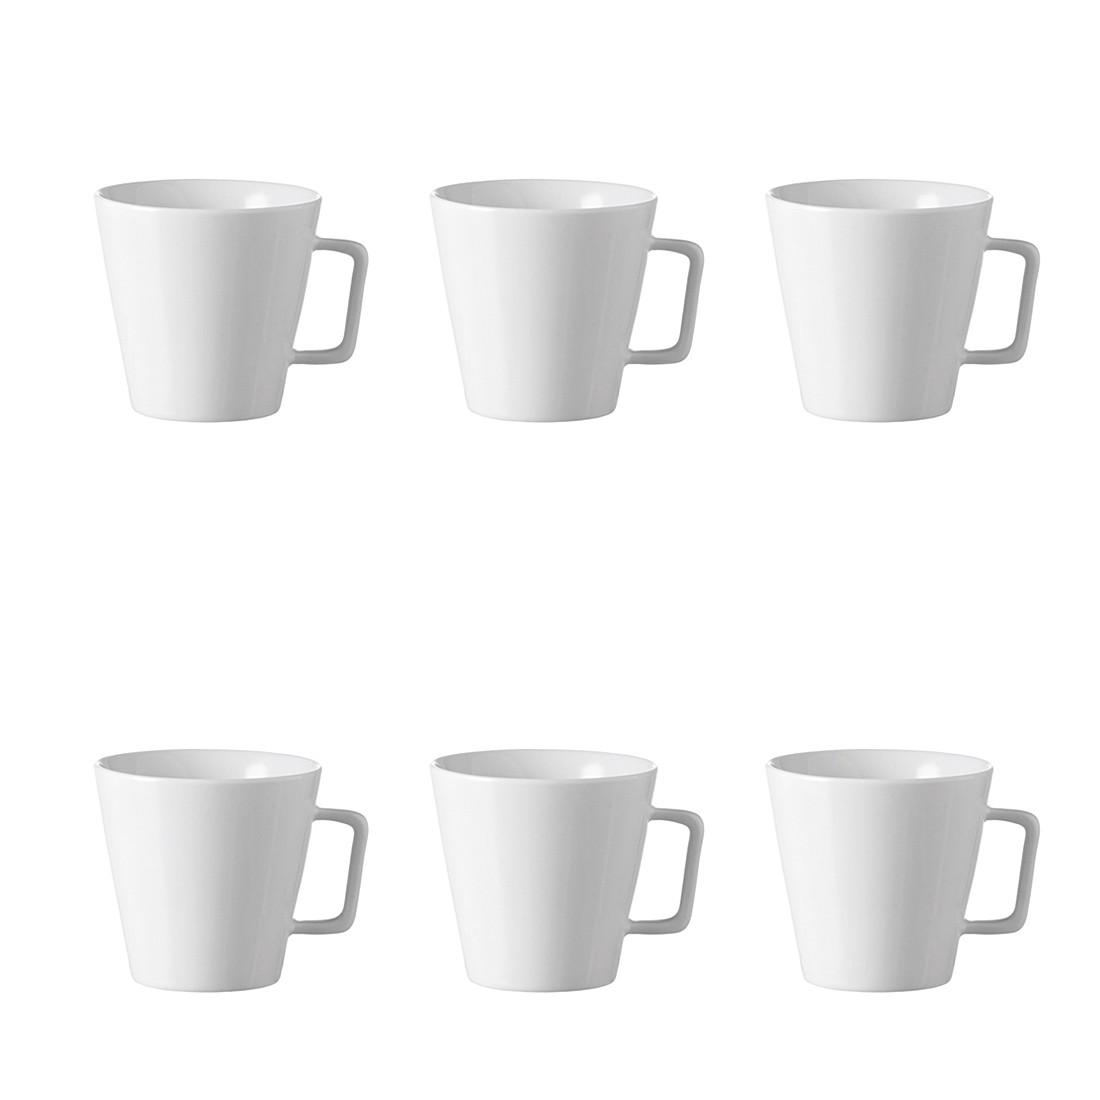 Tasse Twenty4 (6er-Set), Leonardo jetzt bestellen